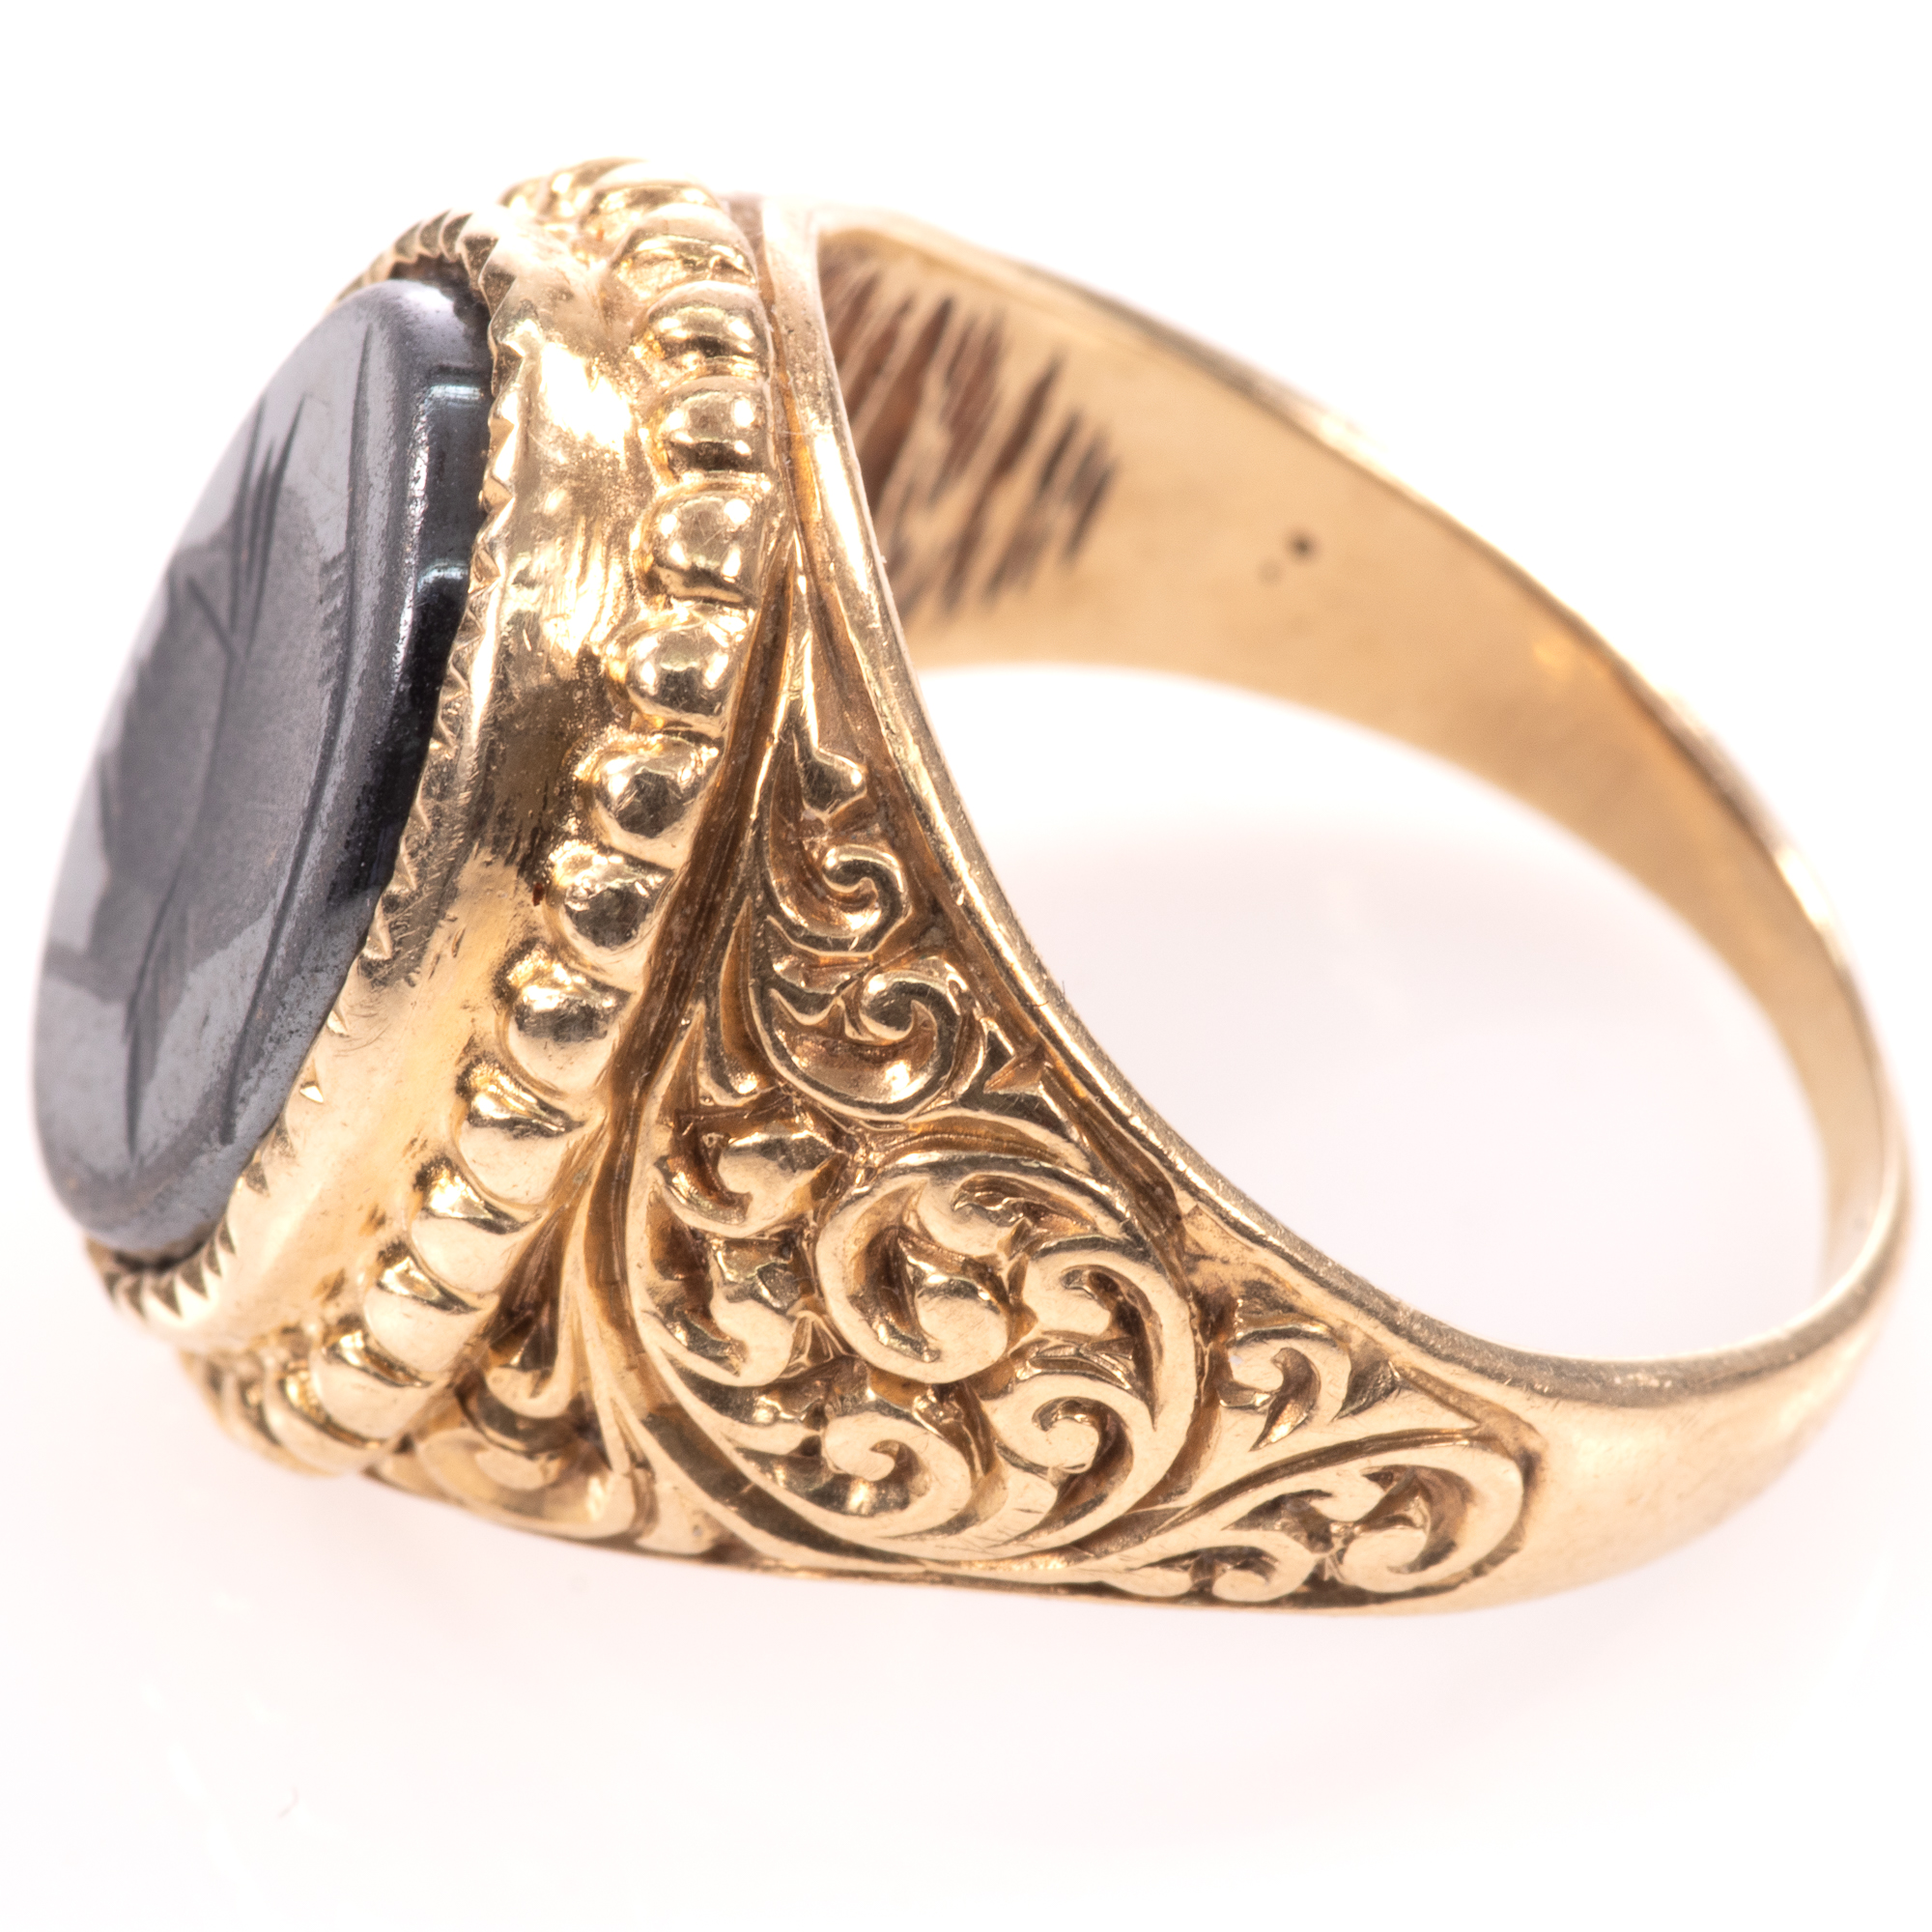 9ct Gold Centurion Onyx Signet Ring - Image 4 of 7